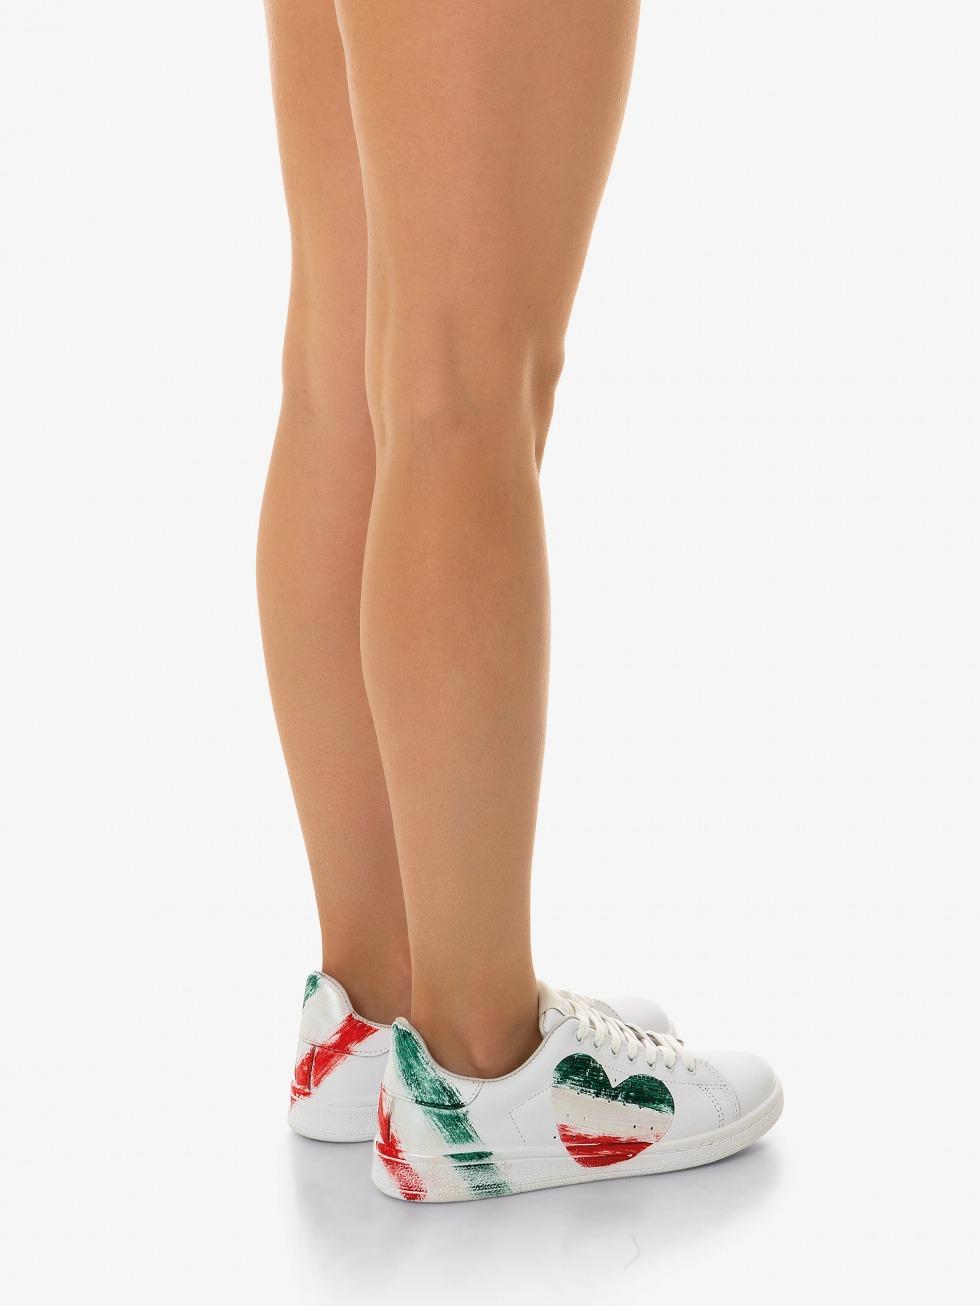 Daiquiri White Sneakers - Italy Flag Heart